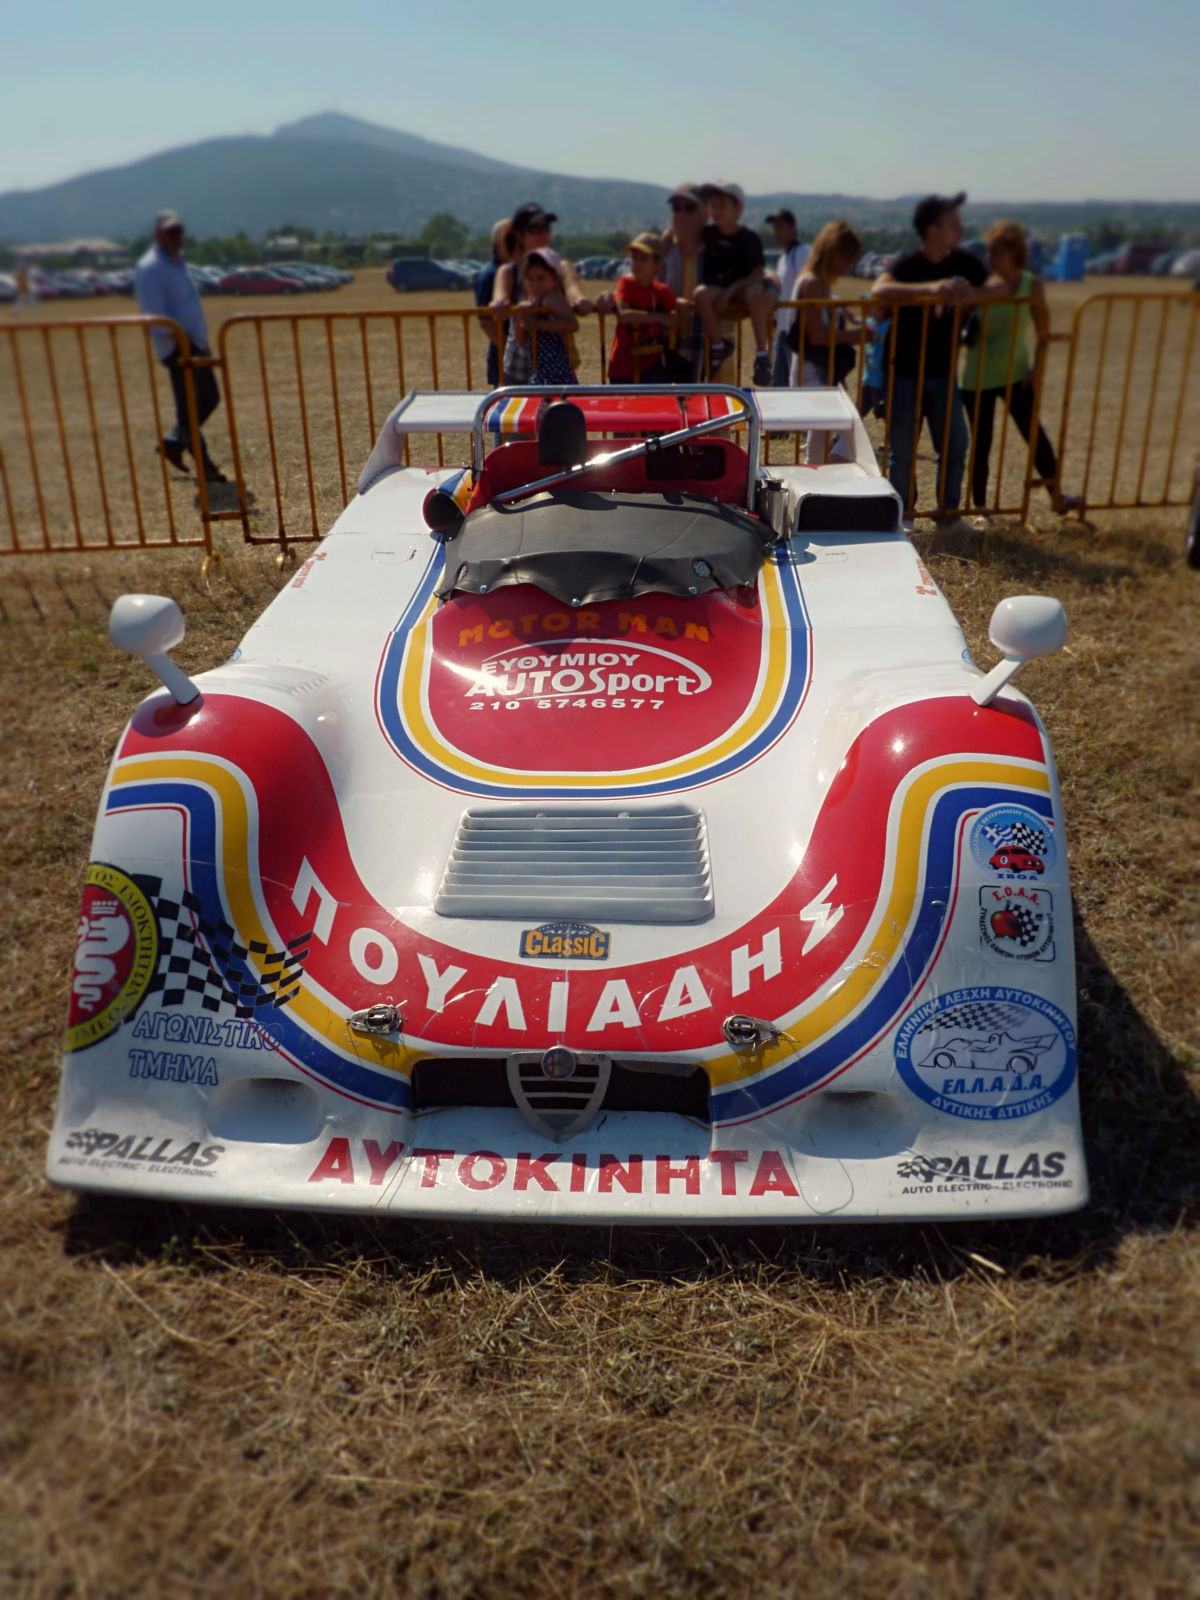 PHILPA Classic Tatoi Circuit (37).jpg